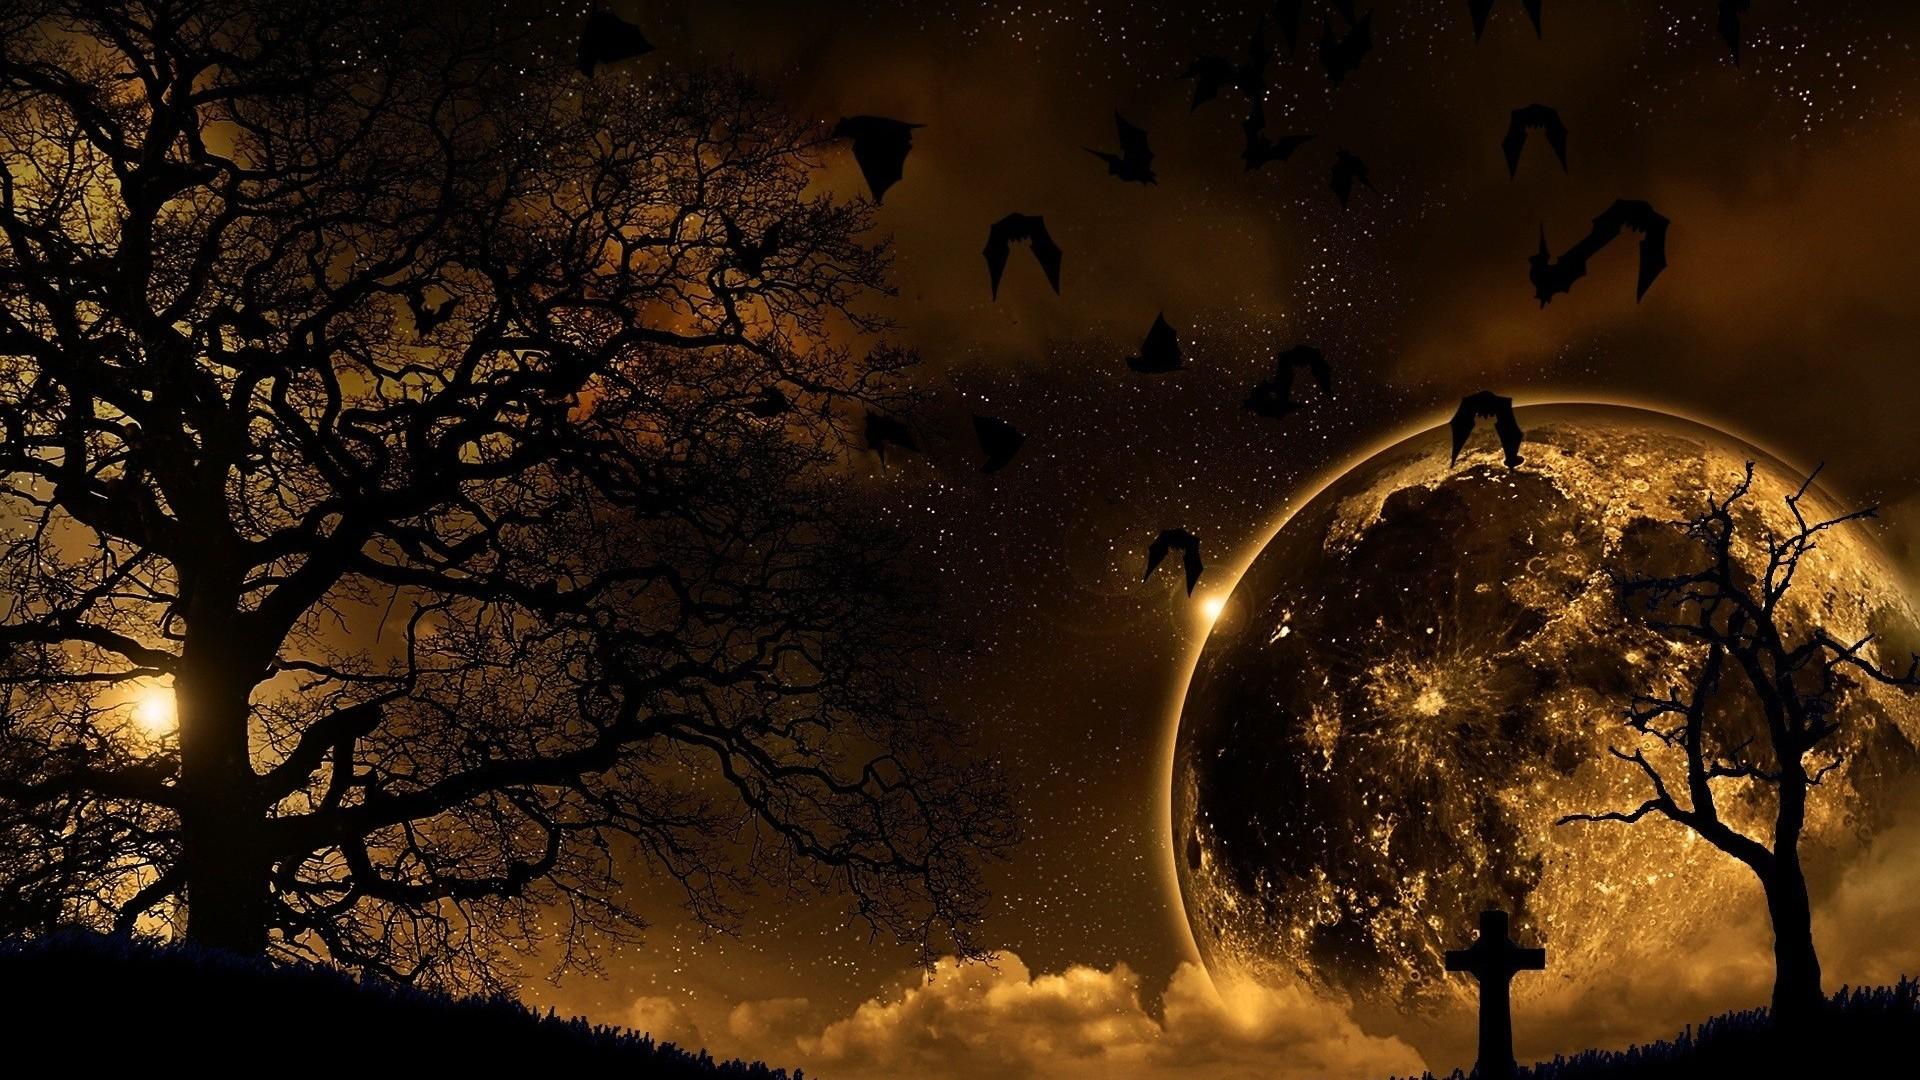 … Background Full HD 1080p. Wallpaper trees, nature, night,  planet, birds, landscape